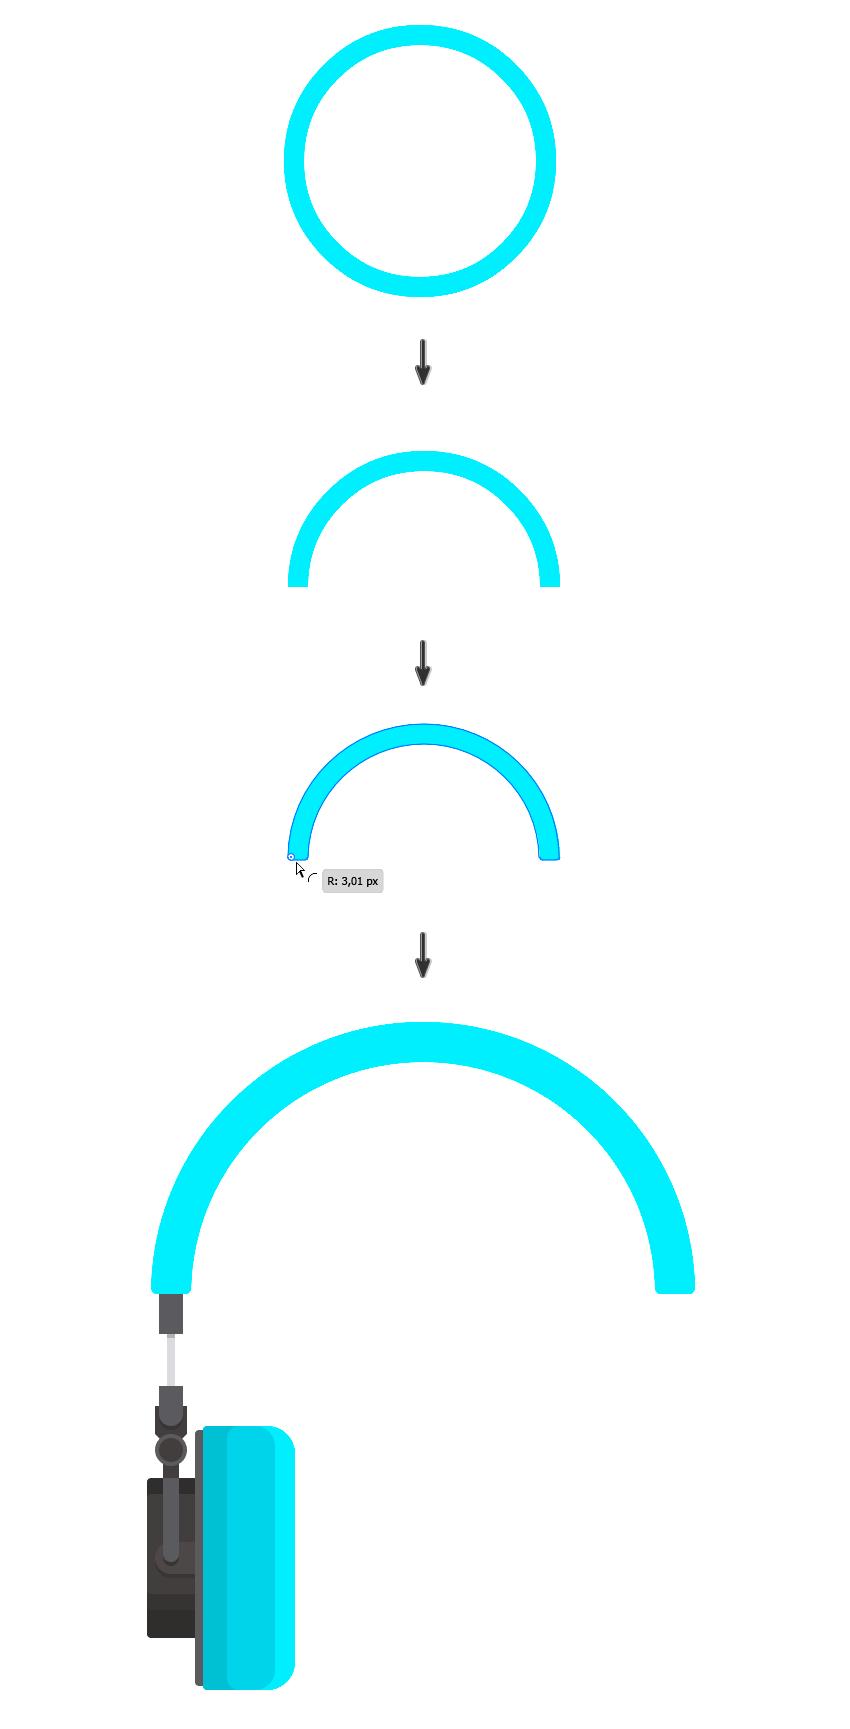 Adding a 252 x 252 px ellipse for the headphones headband